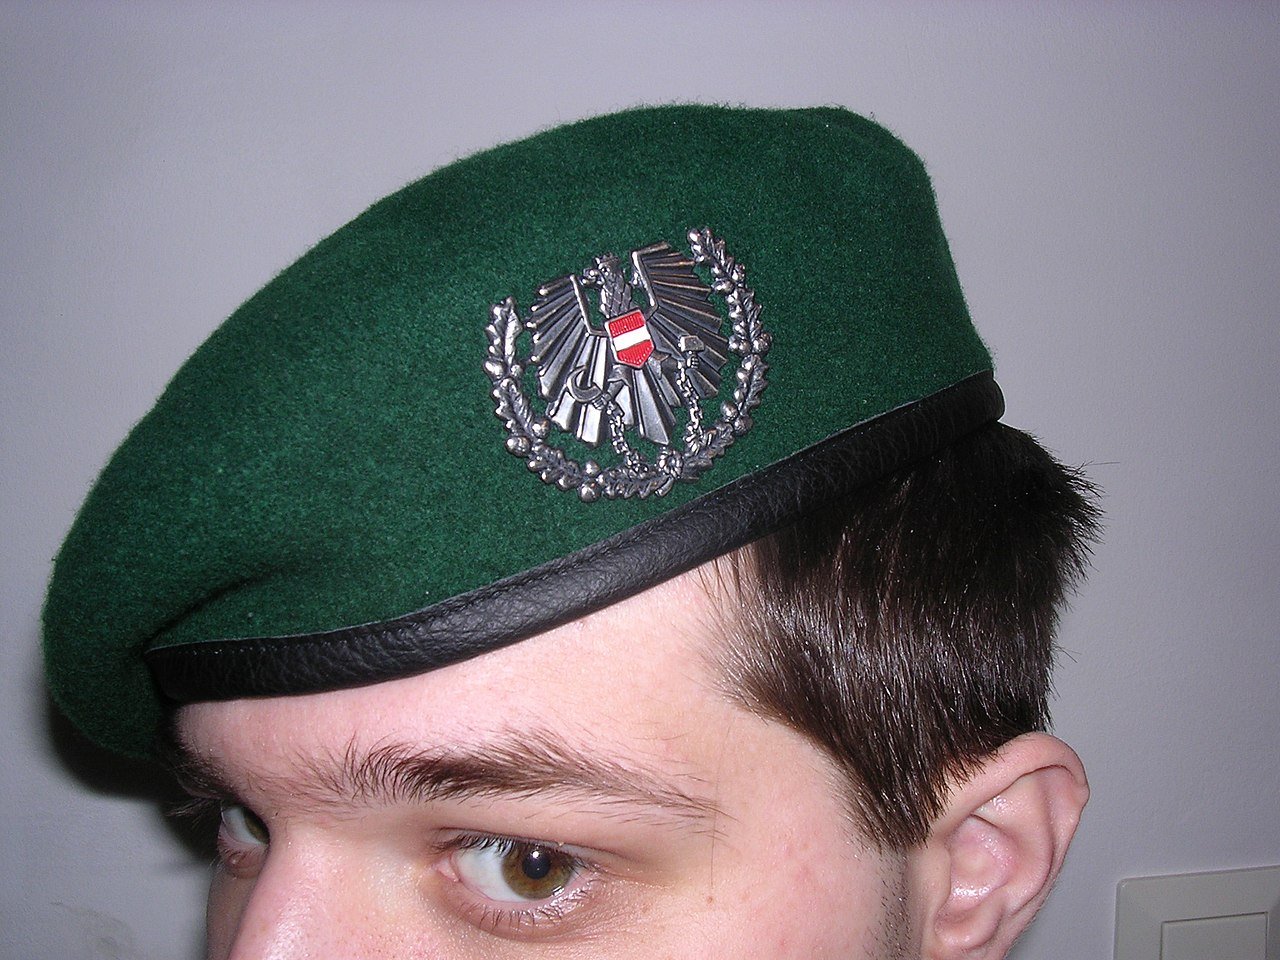 Dating a green beret